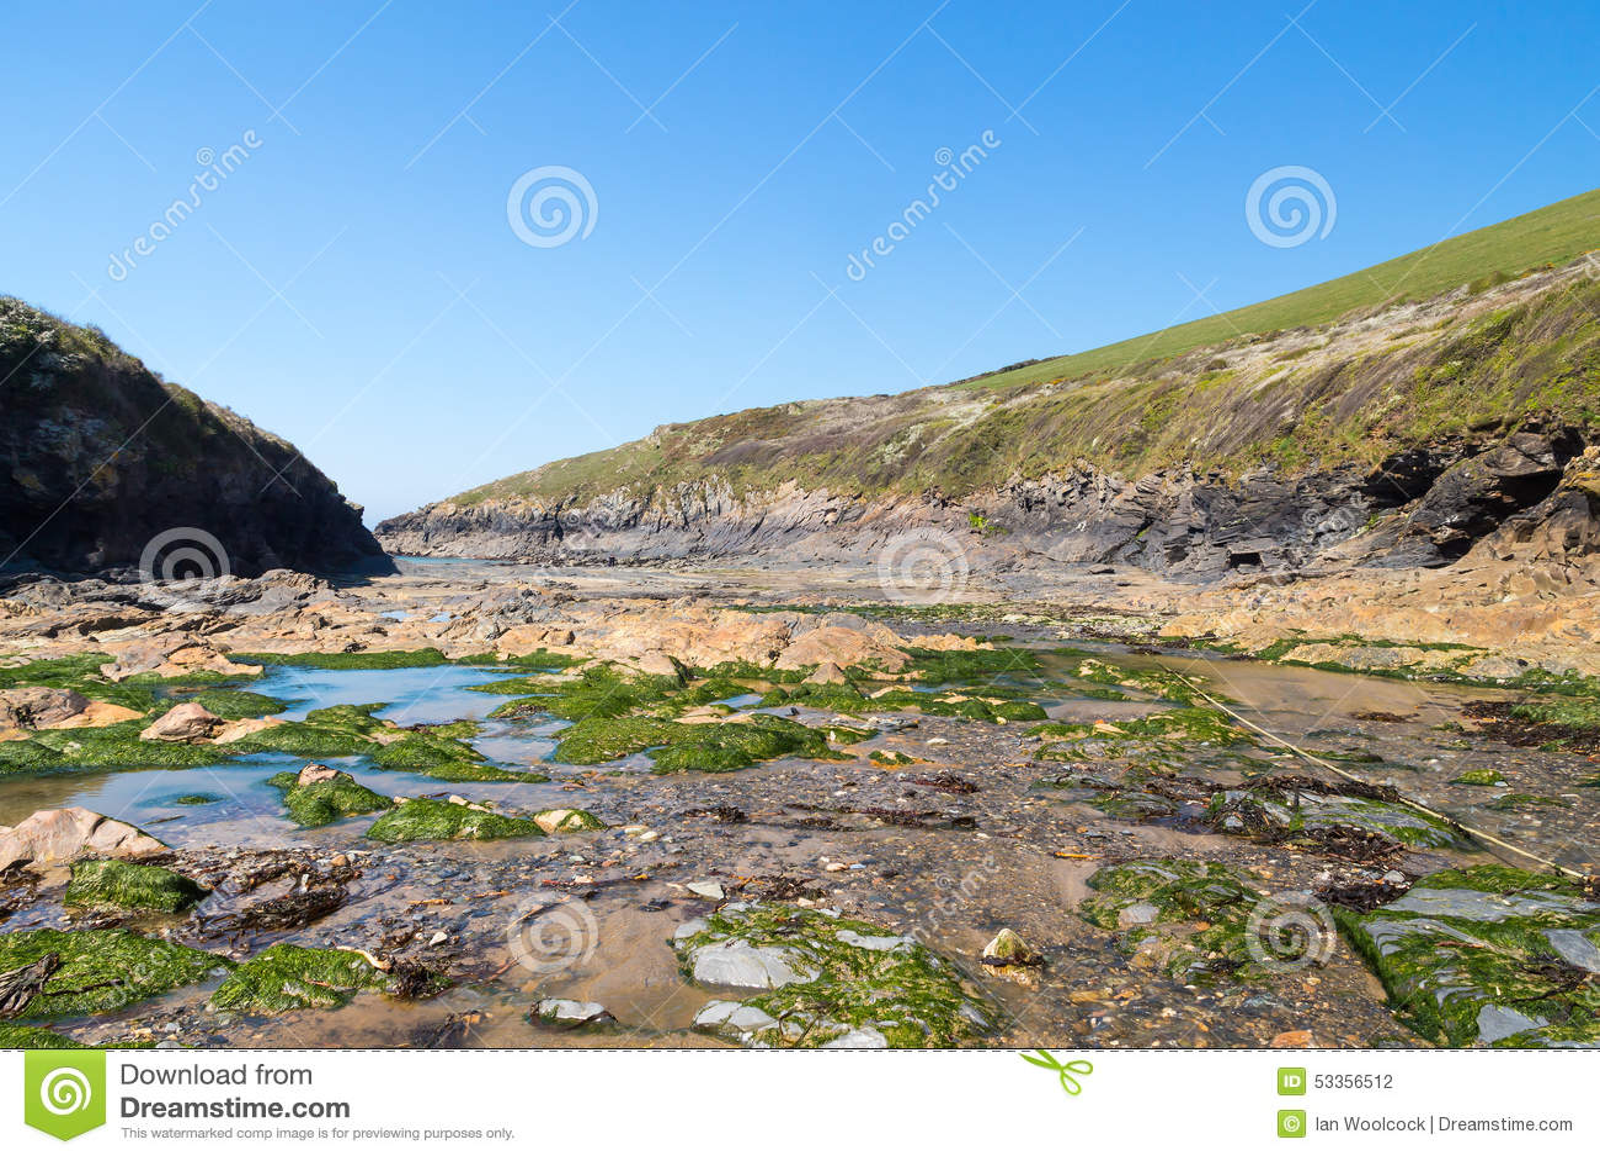 Puerto Quin Cornwall England